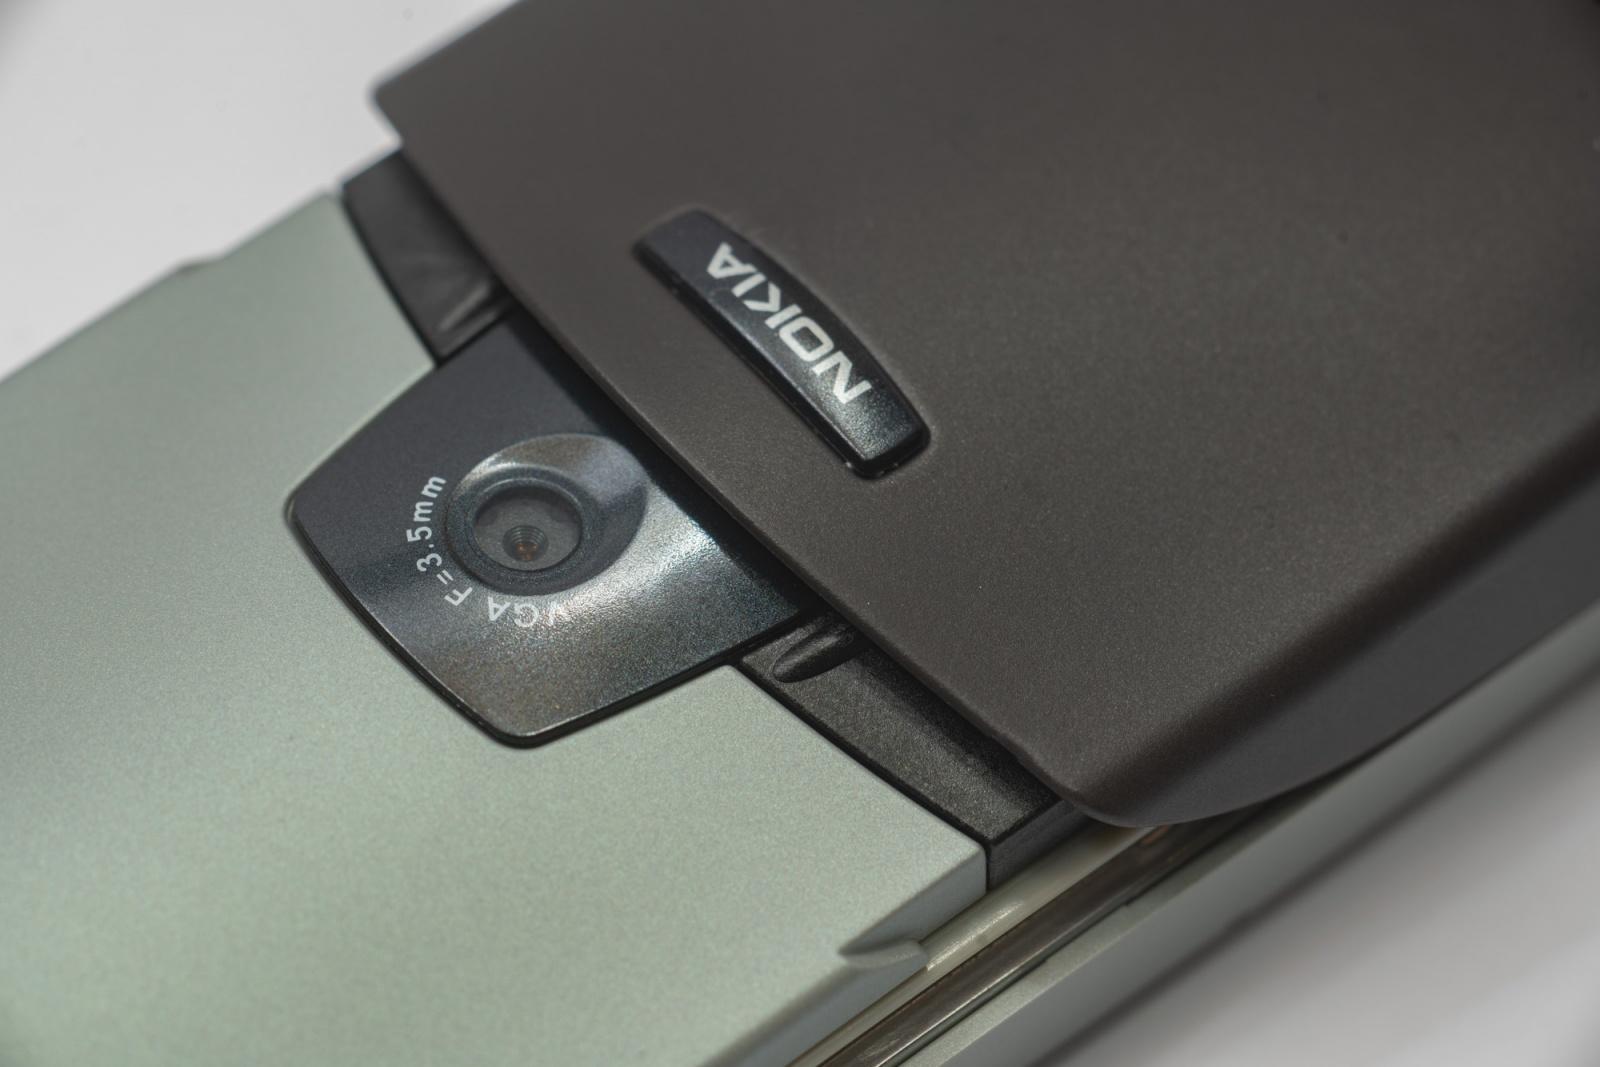 Nokia 7650 и начало эпохи смартфонов - 13